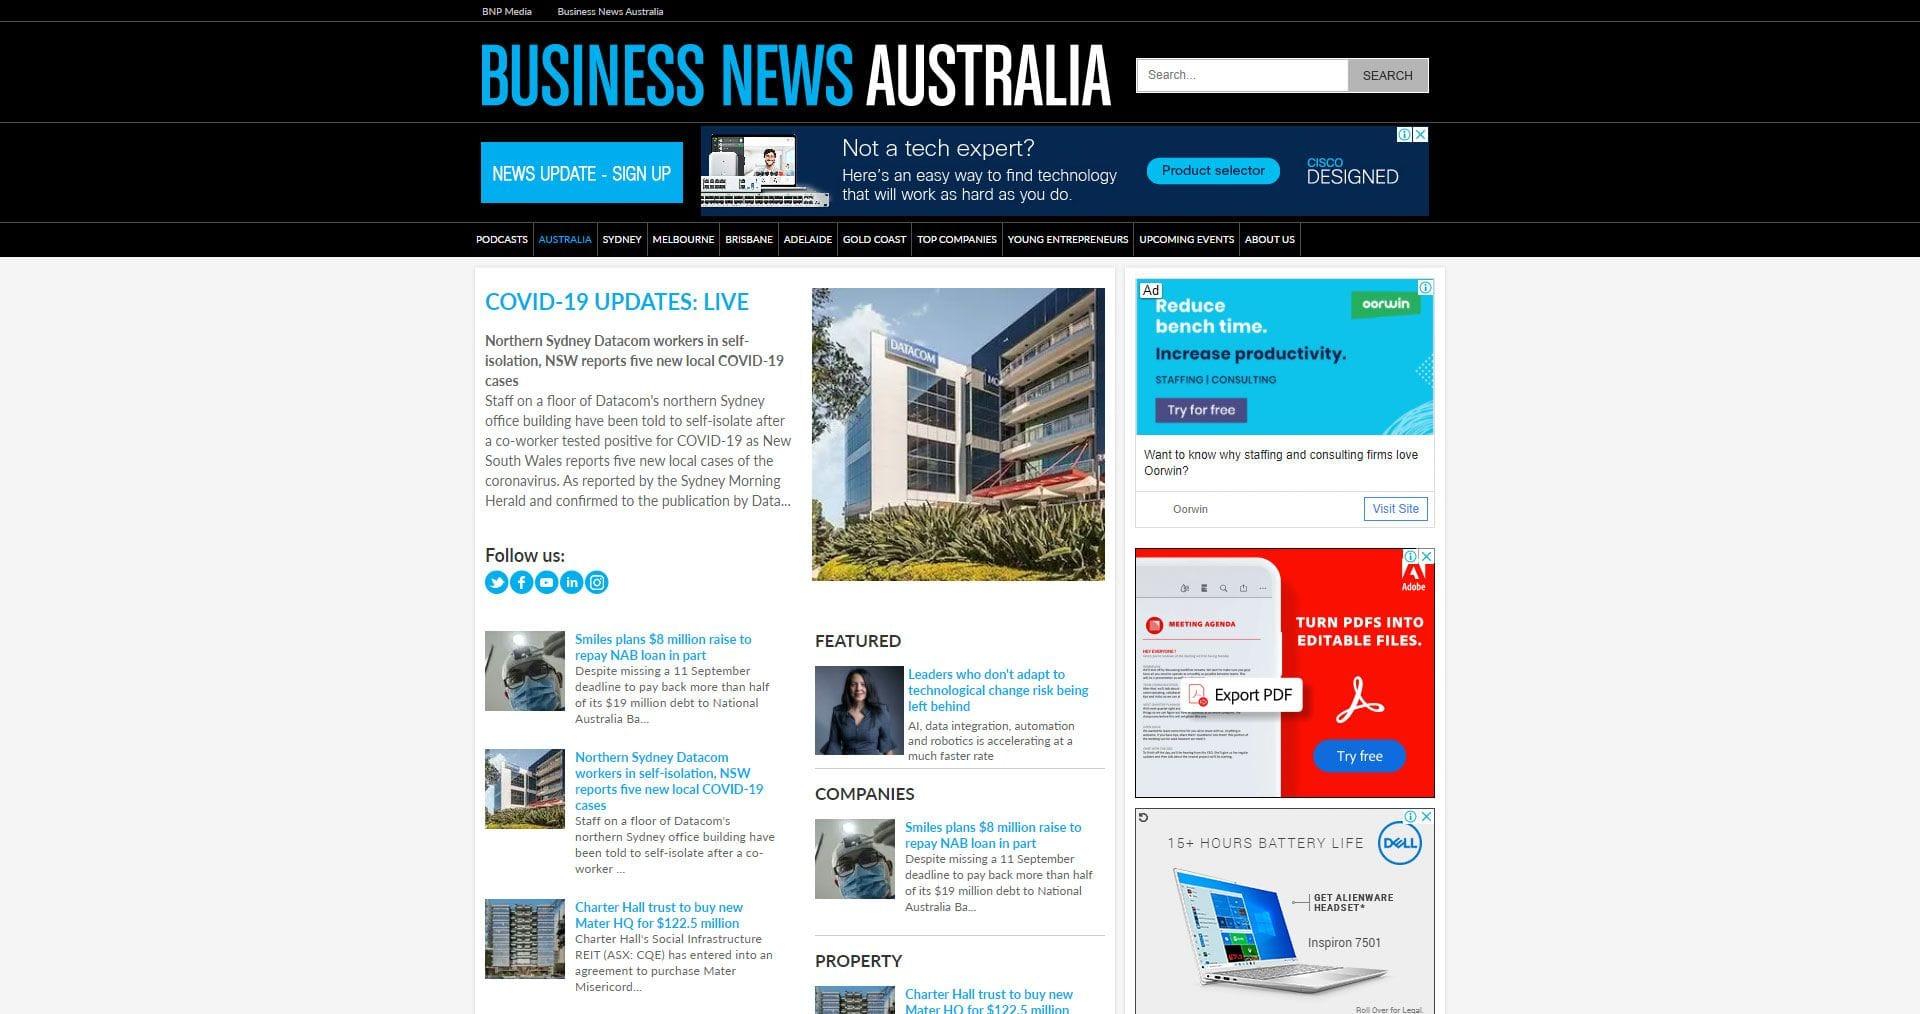 Business News Australia | Client Success Story